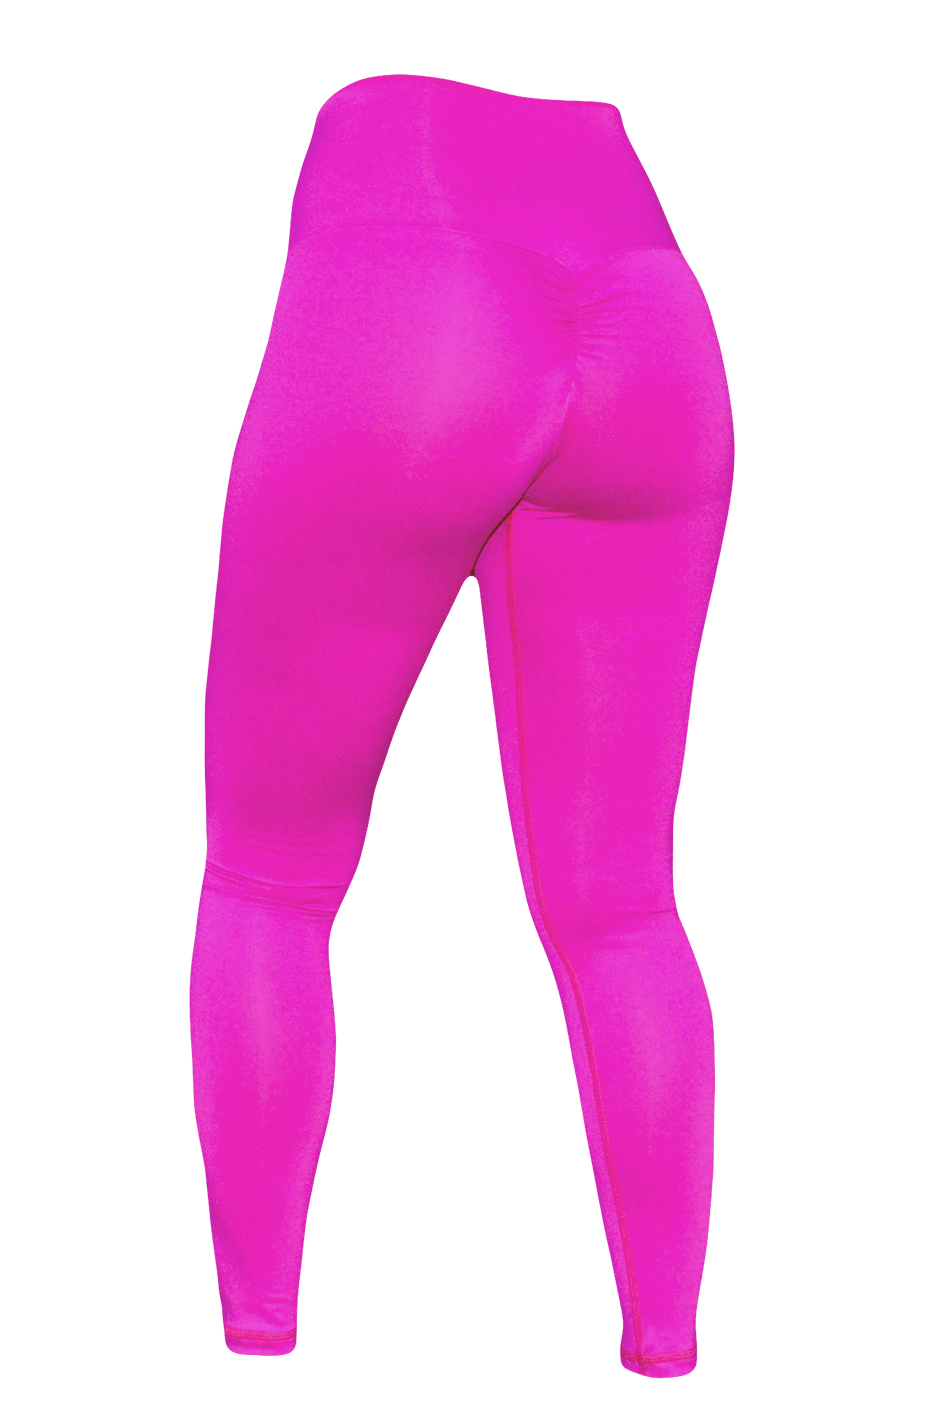 Shaper pink 3-mfit